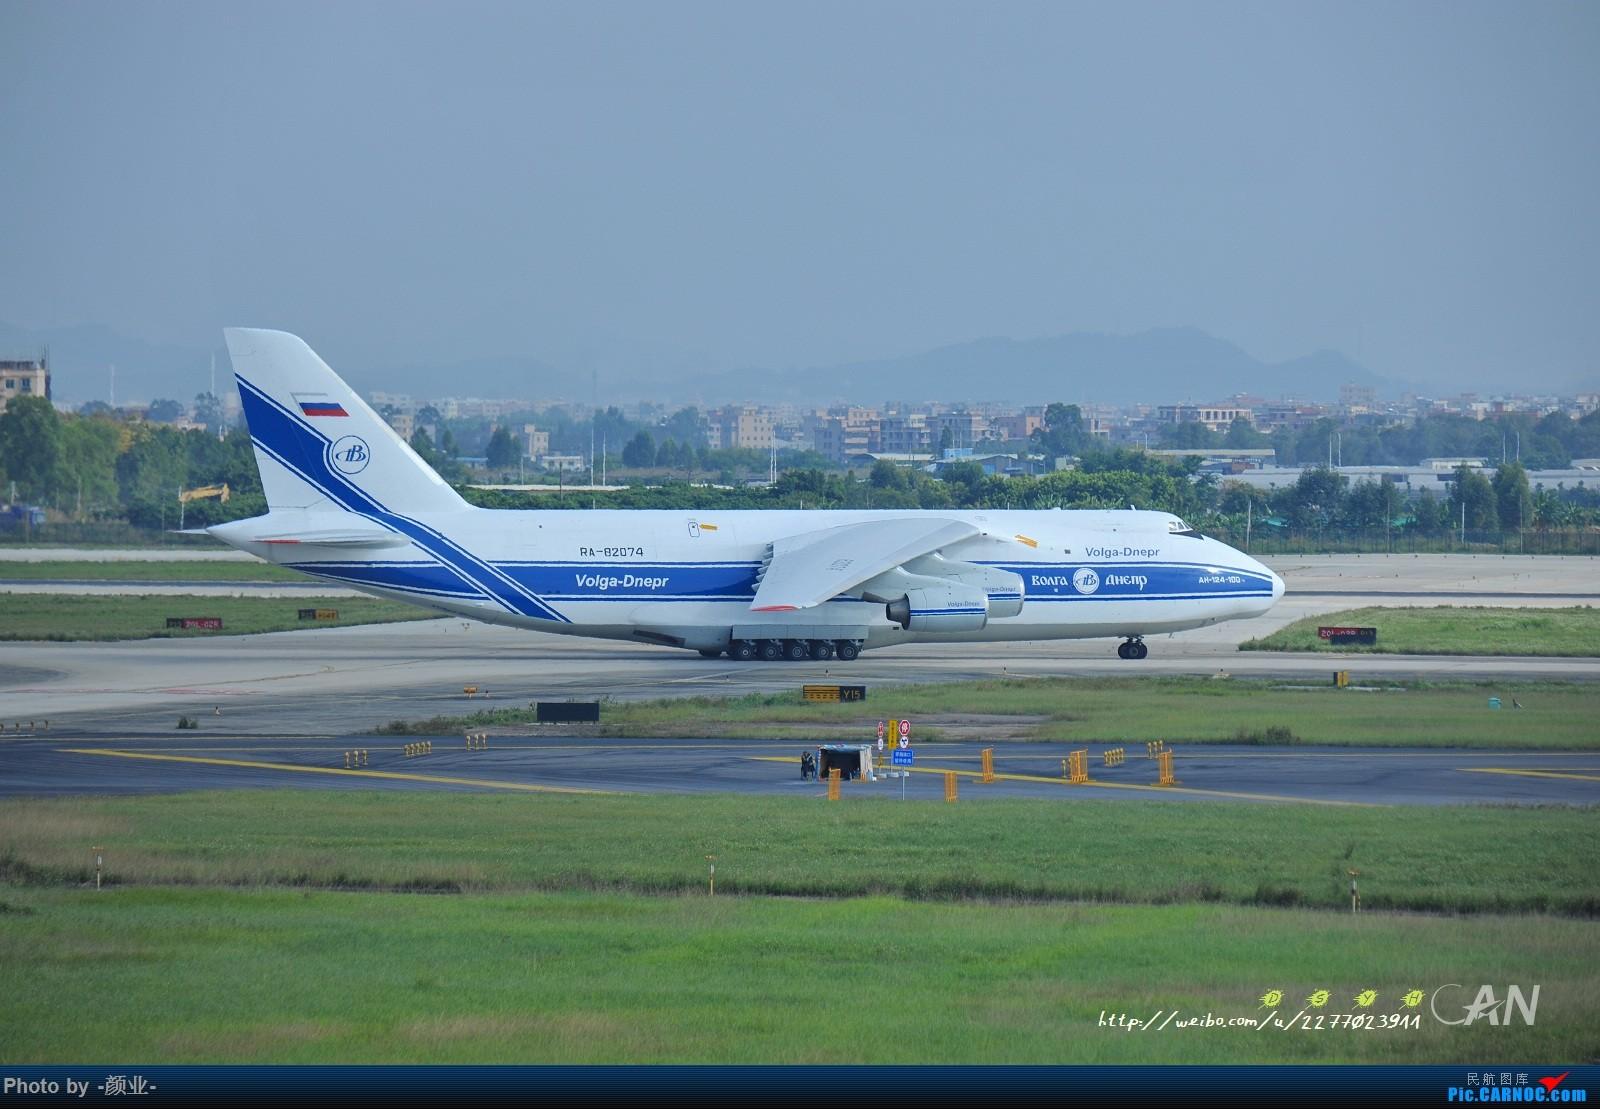 Re:[原创]2011-2016我的打灰机心情[广州] ANTONOV AN-124 RA-82074 中国广州白云国际机场